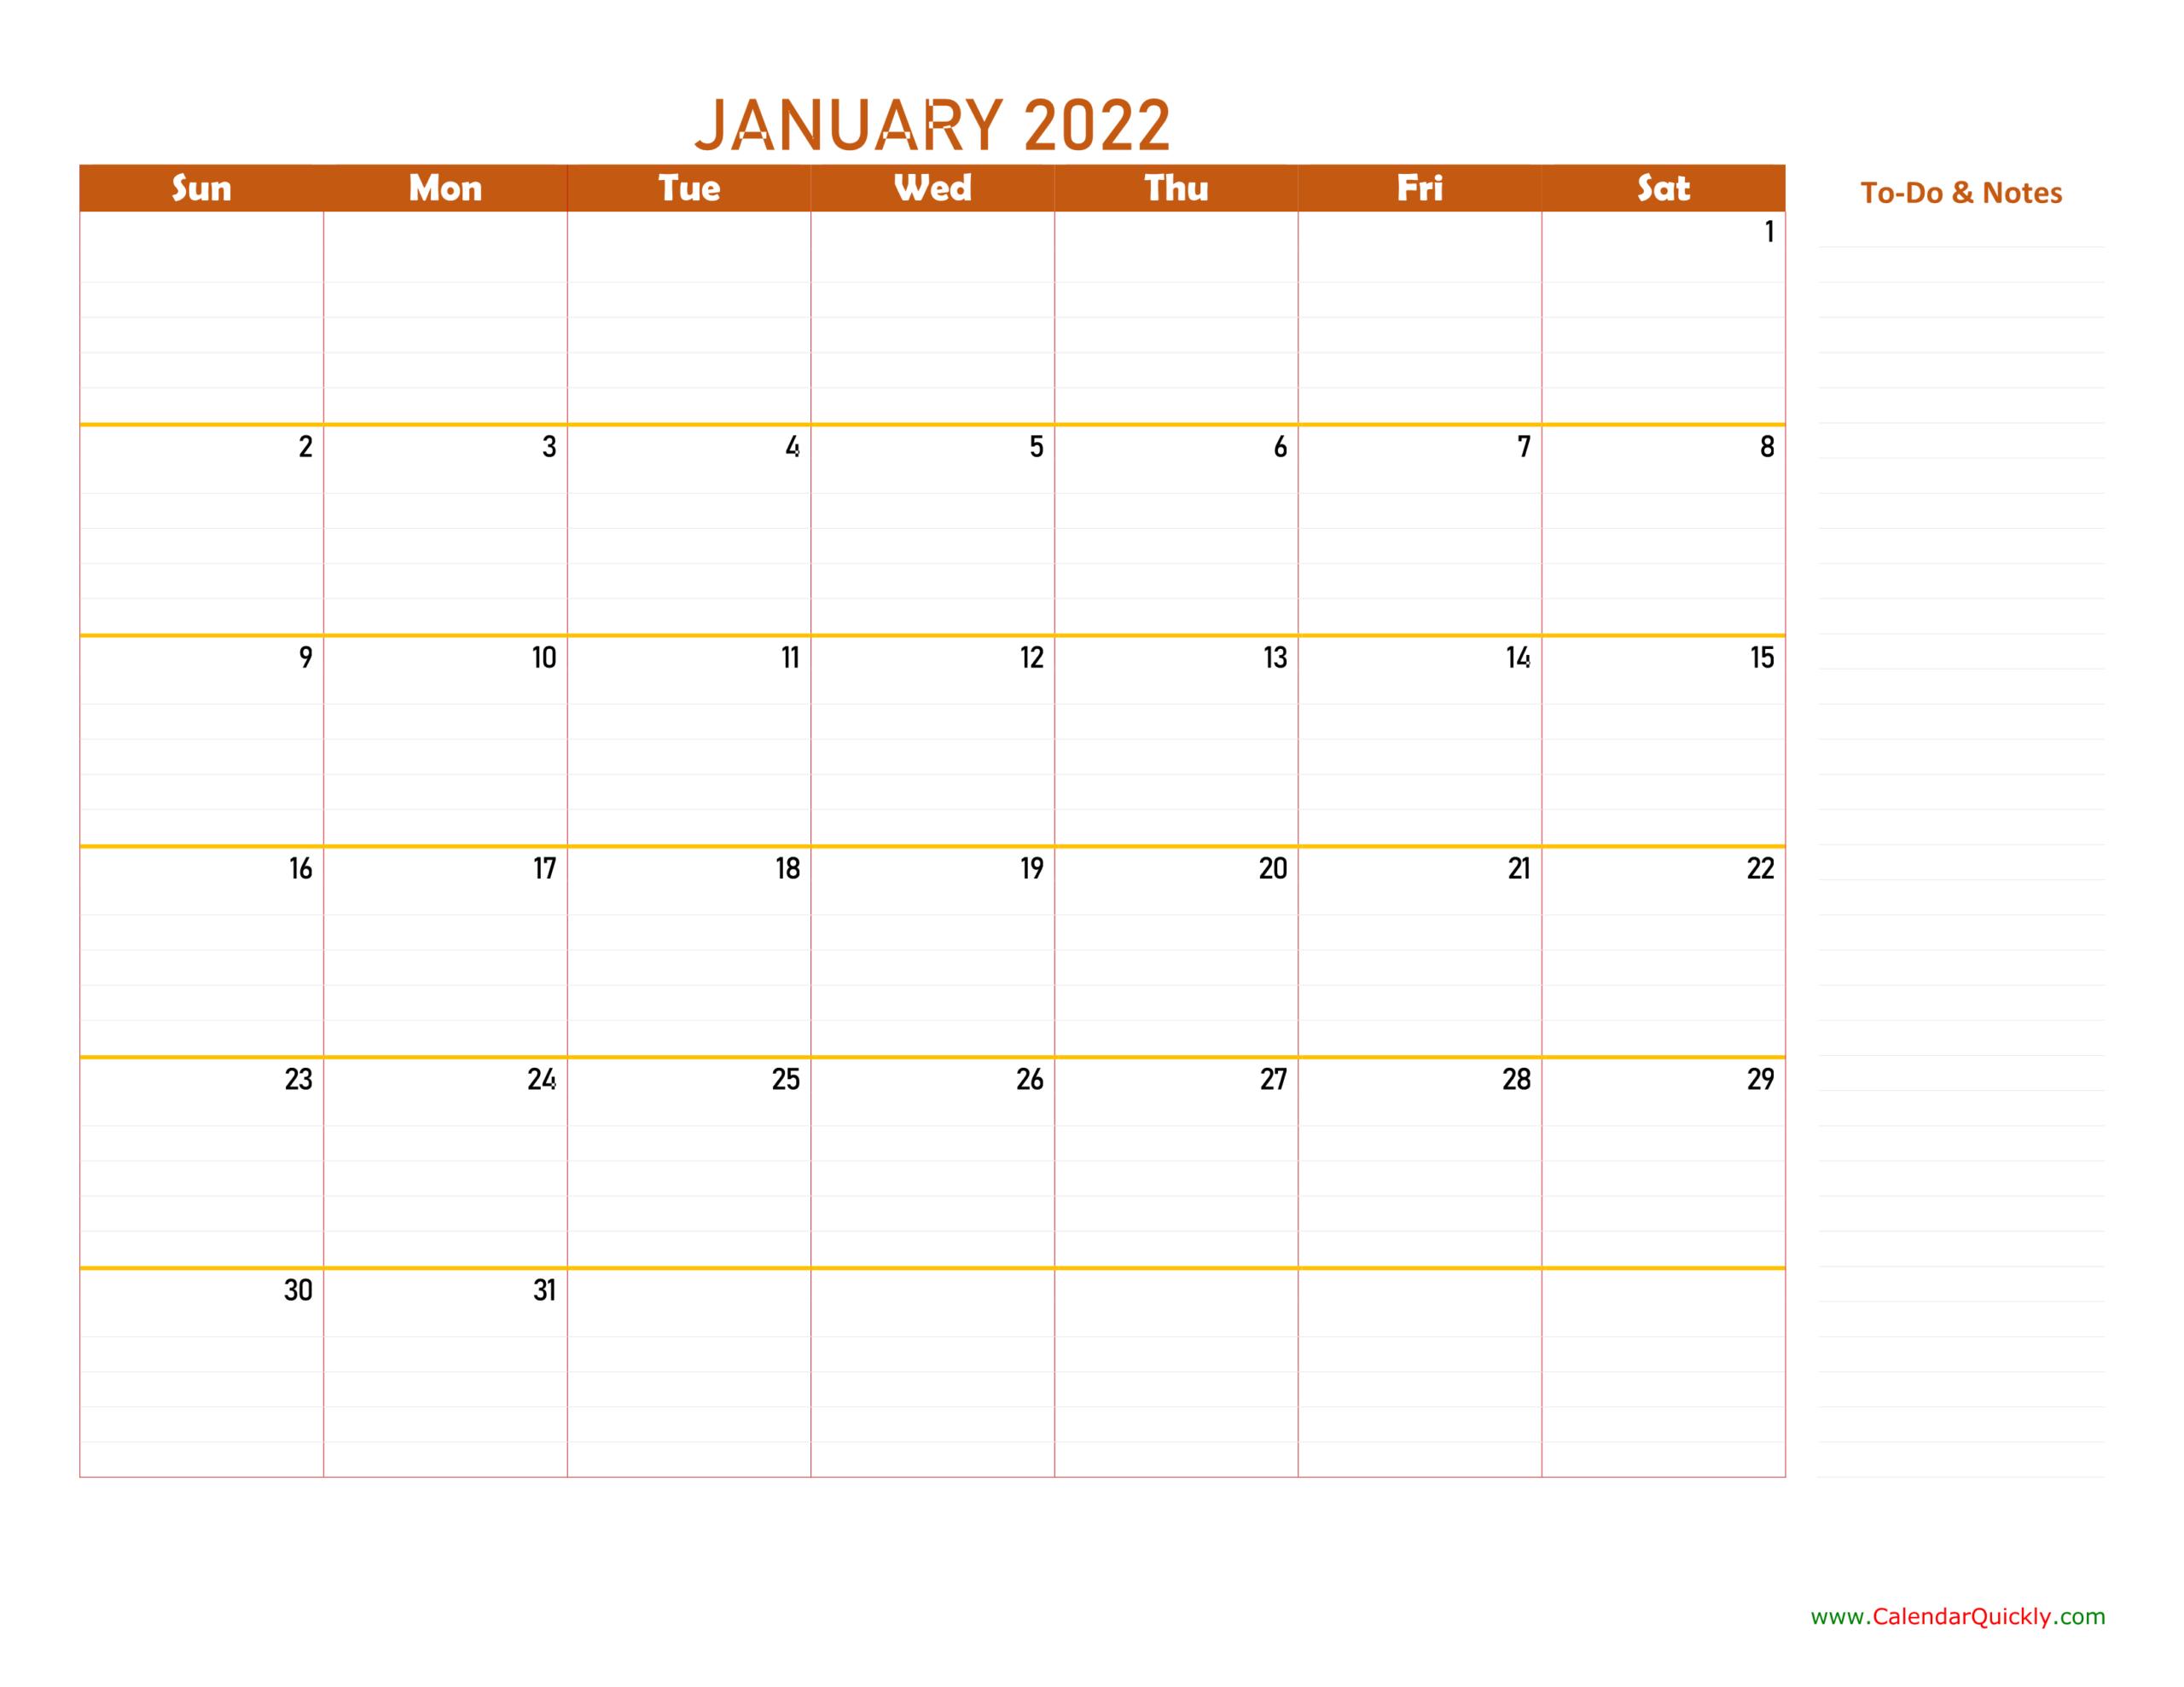 January 2022 Calendar   Calendar Quickly throughout Everyday Is A Holiday Calendar 2022